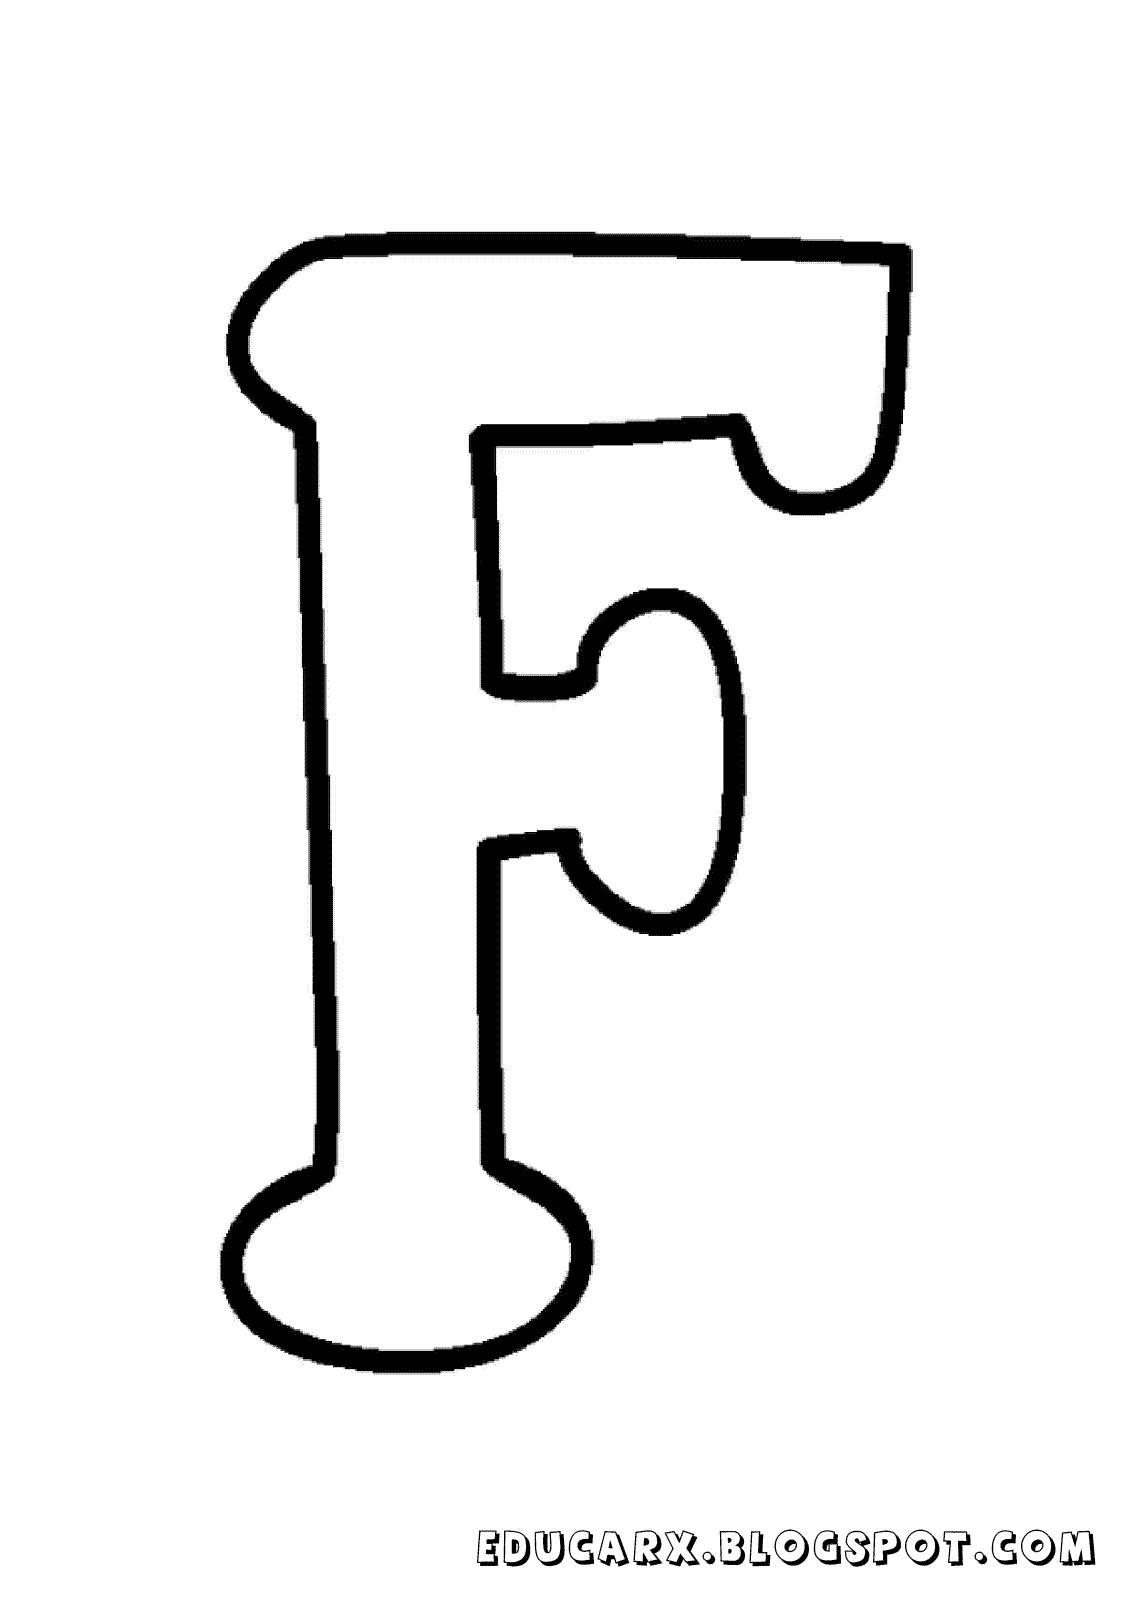 Molde da letra maiúscula F